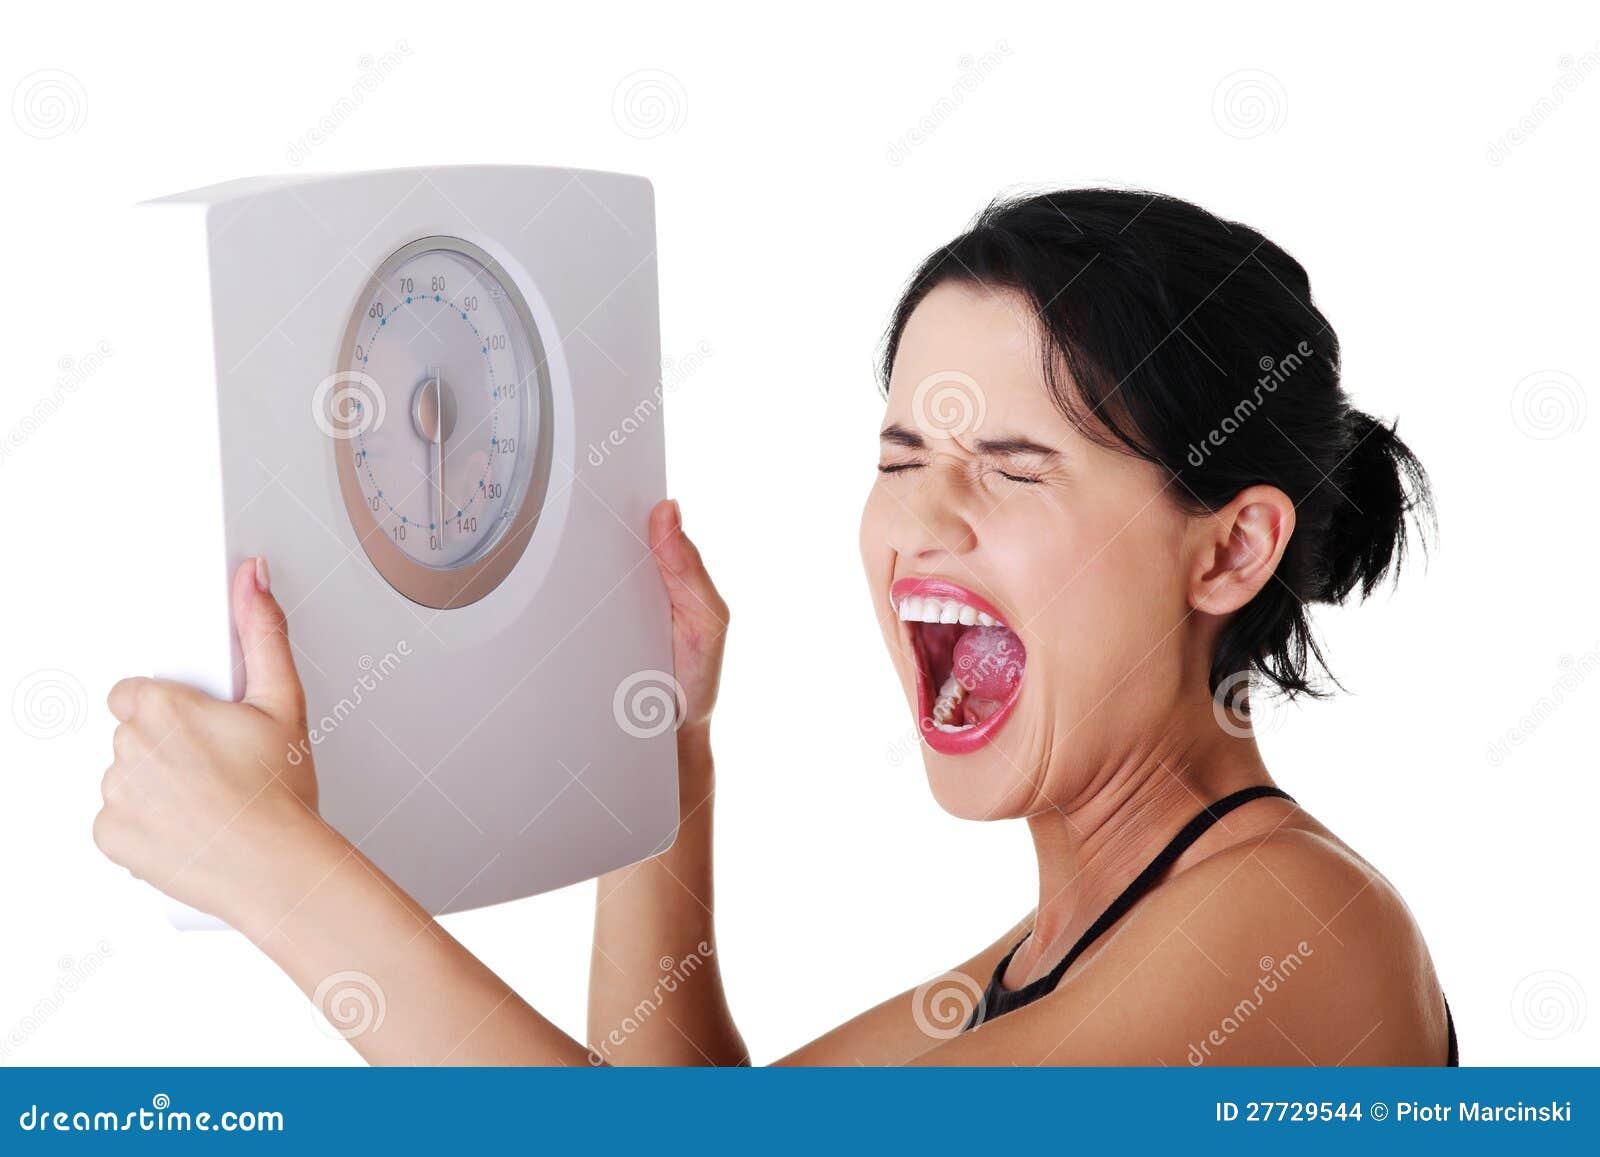 Frustrierte Frau mit Skala